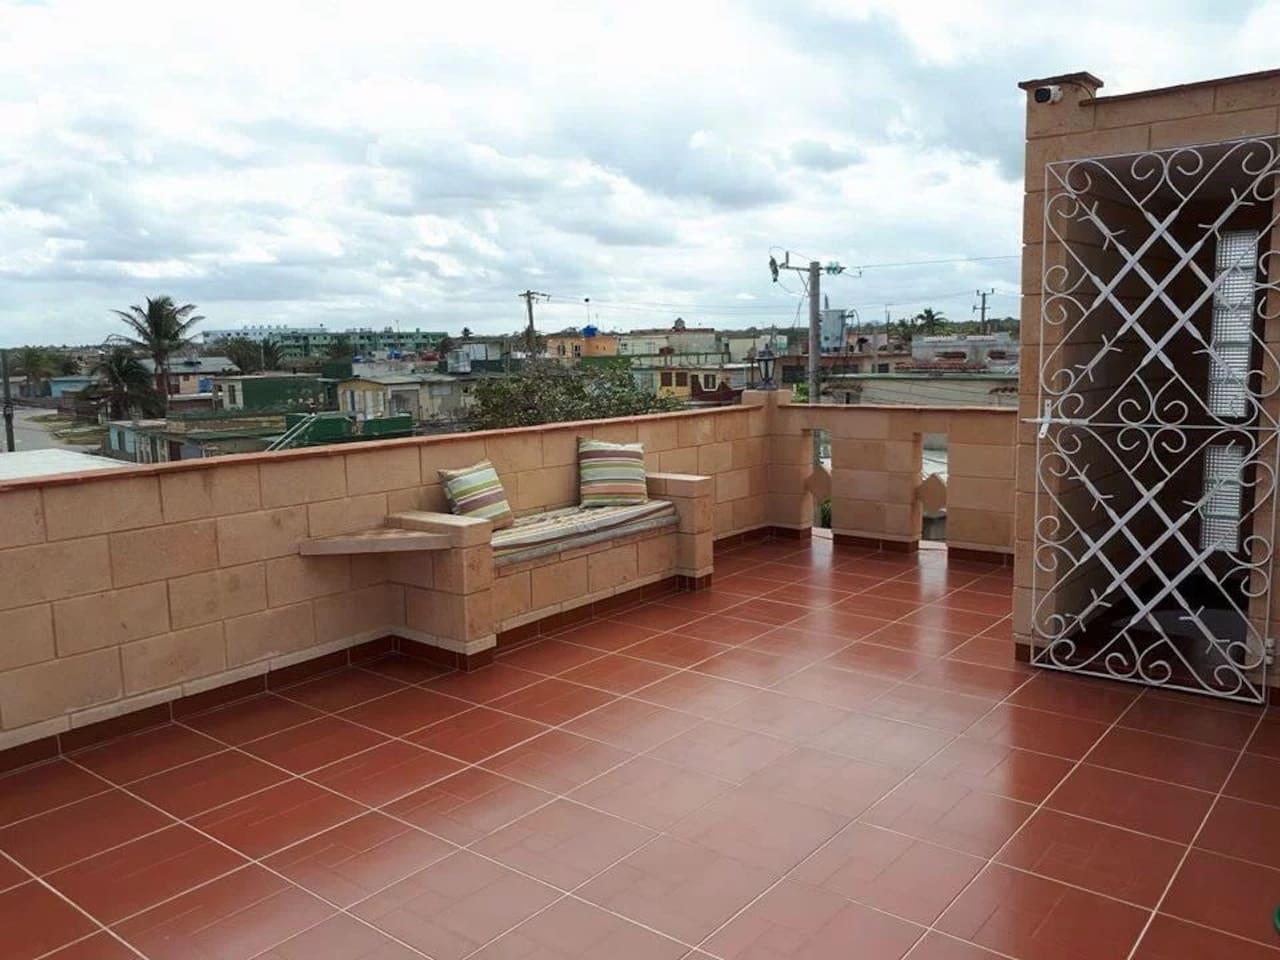 Apartment Casa Oceanview 2 - Luxury   Amazing View photo 23408977